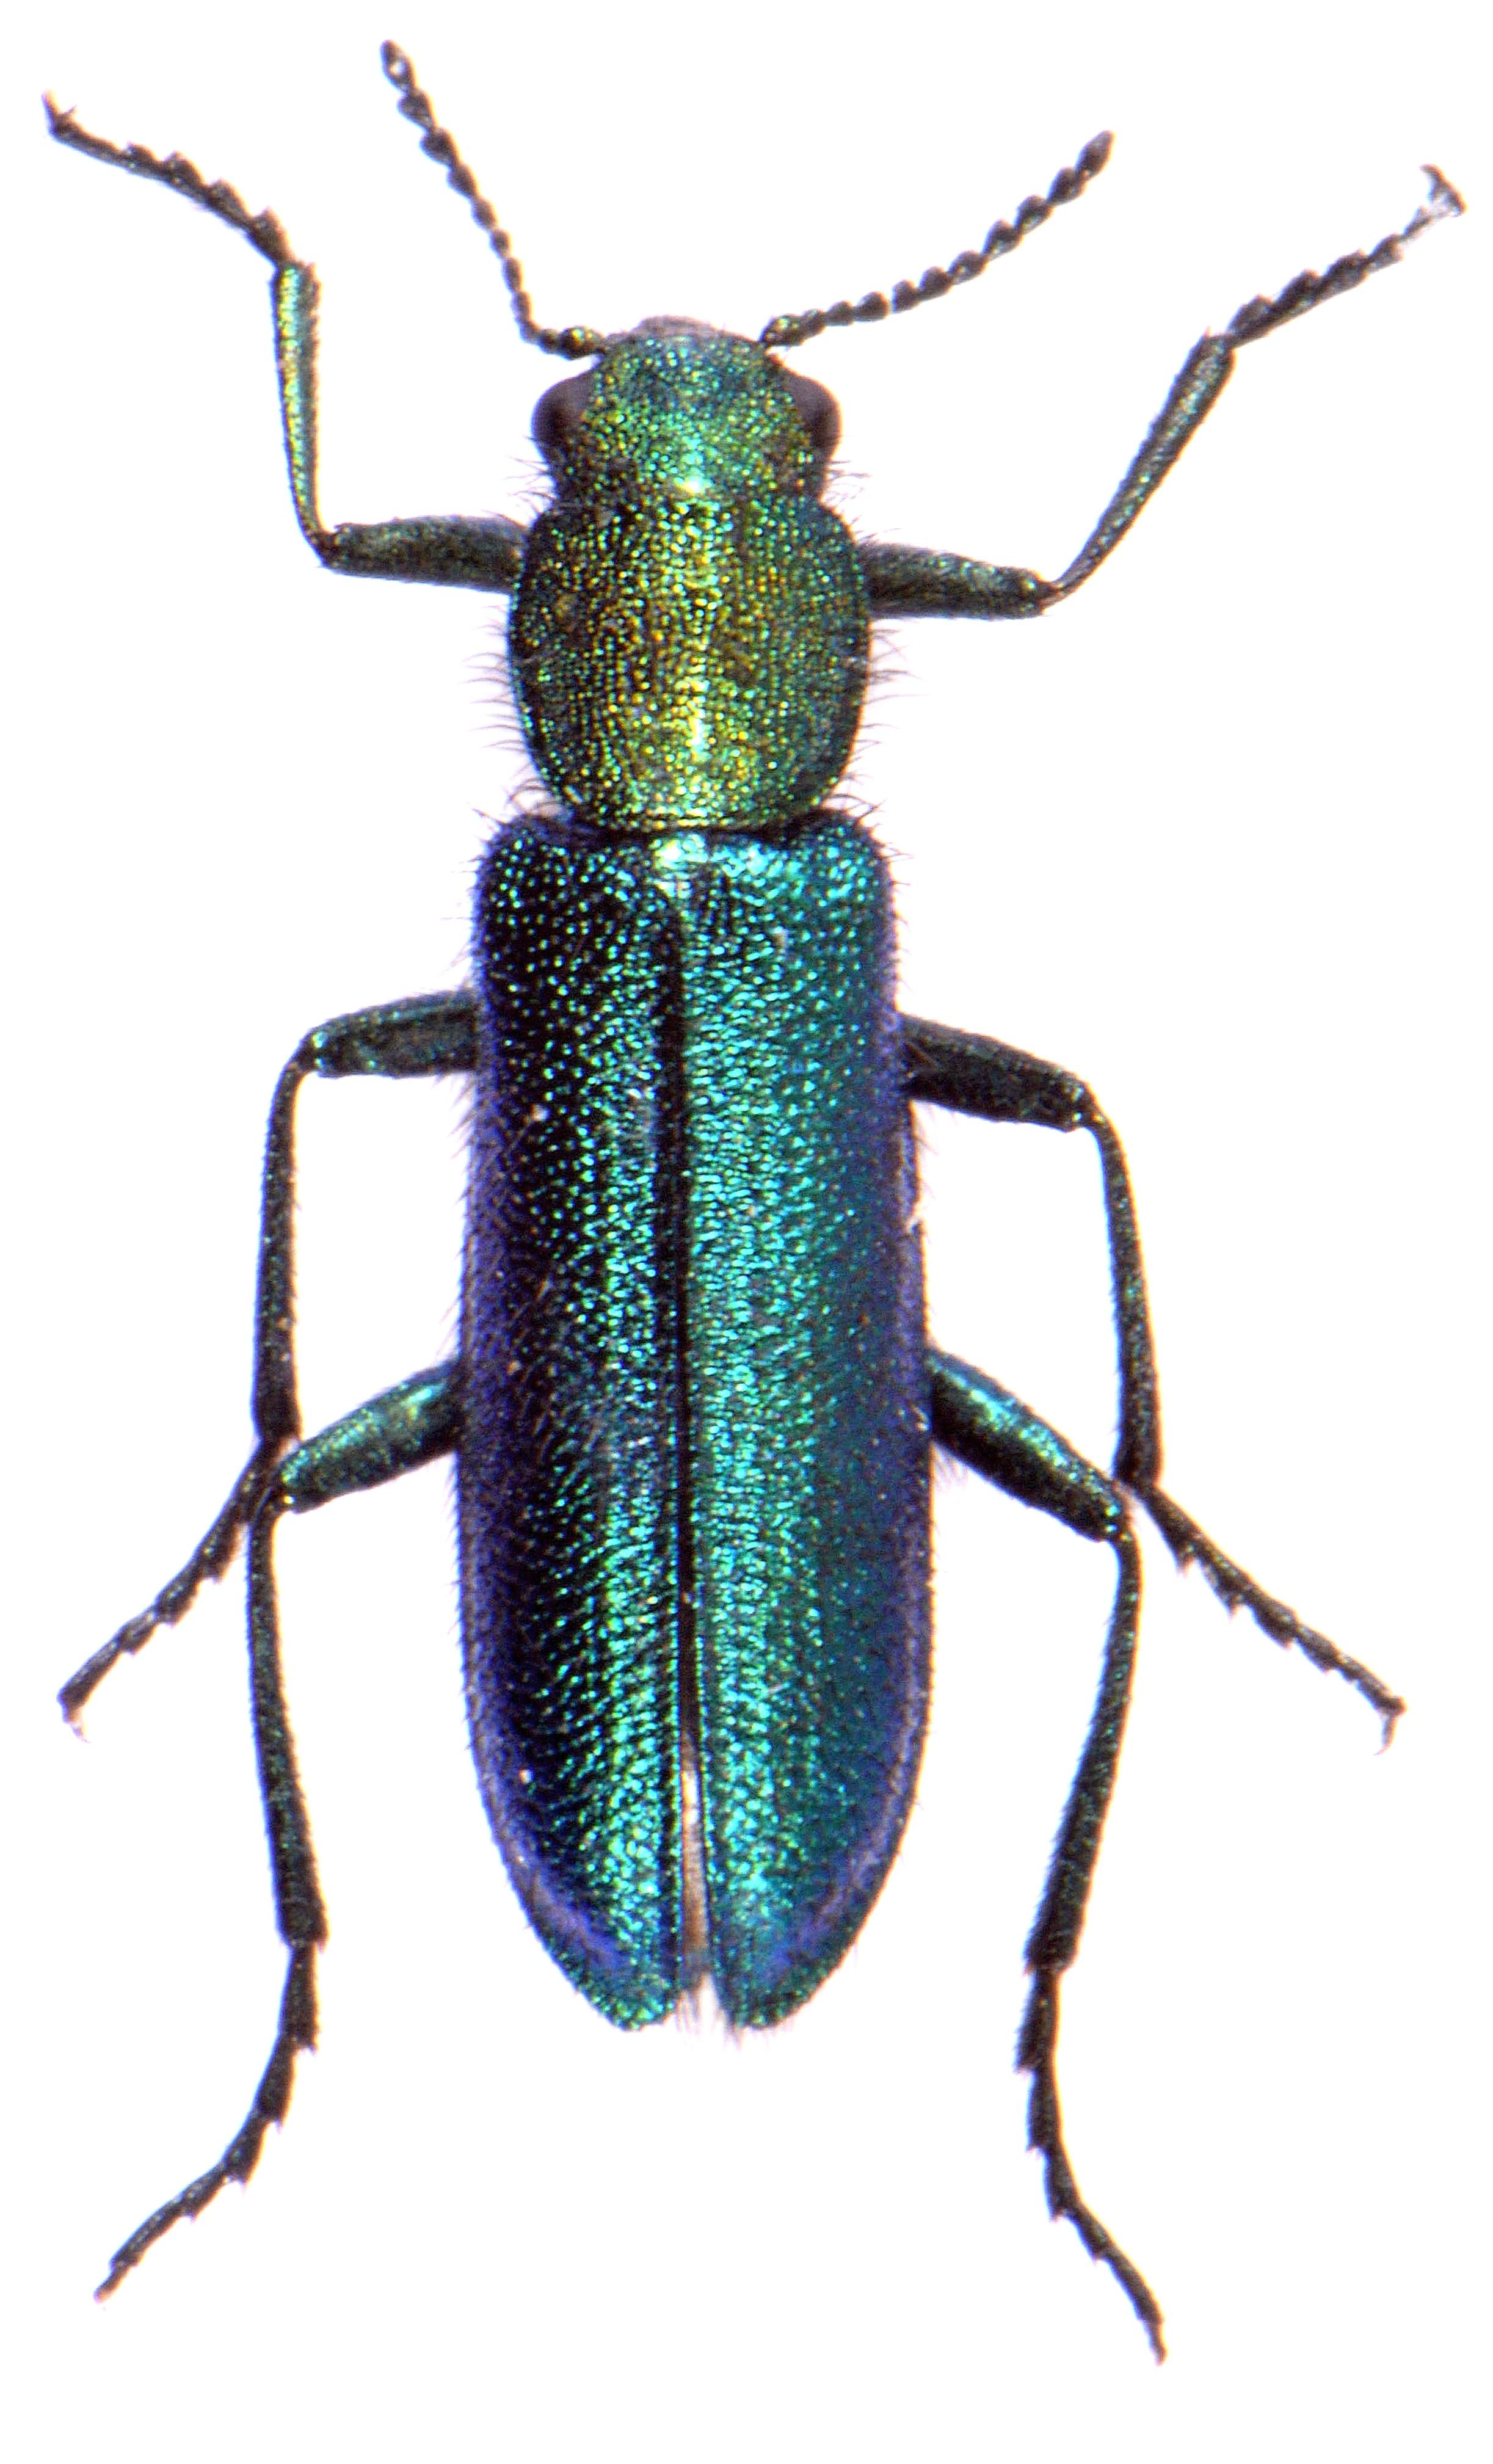 Psilothrix viridicoeruleus